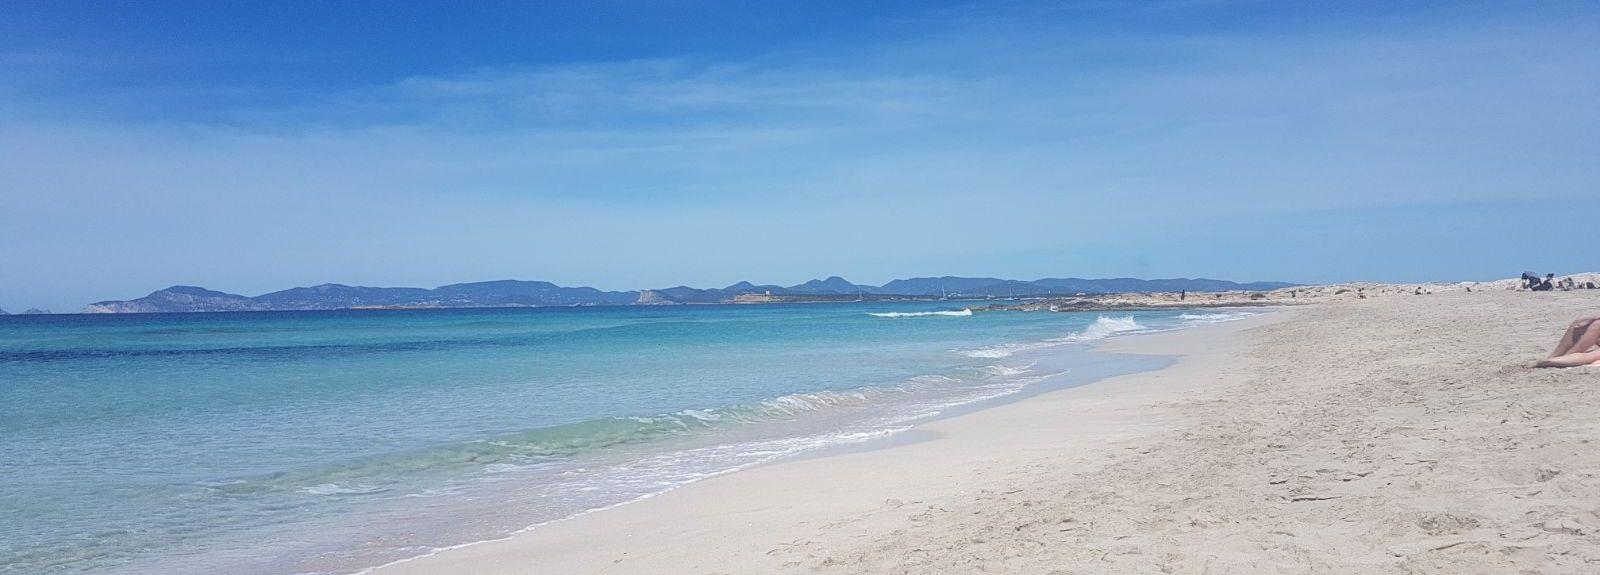 Dalt Vila, Πόλη της Ίμπιζα, Βαλεαρίδες Νήσοι, Ισπανία